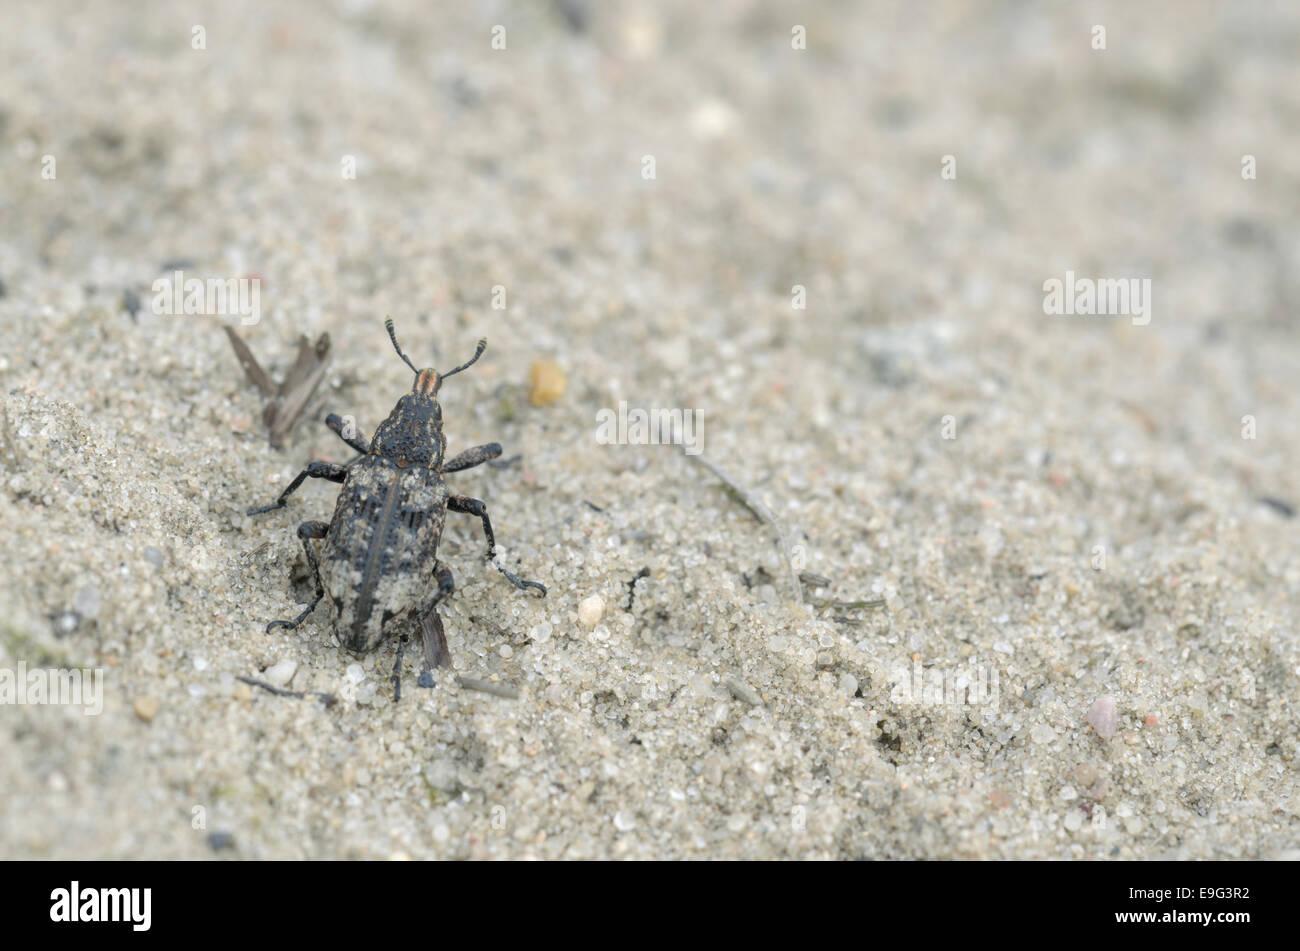 Snout beetle (Coniocleonus hollbergi) - Stock Image